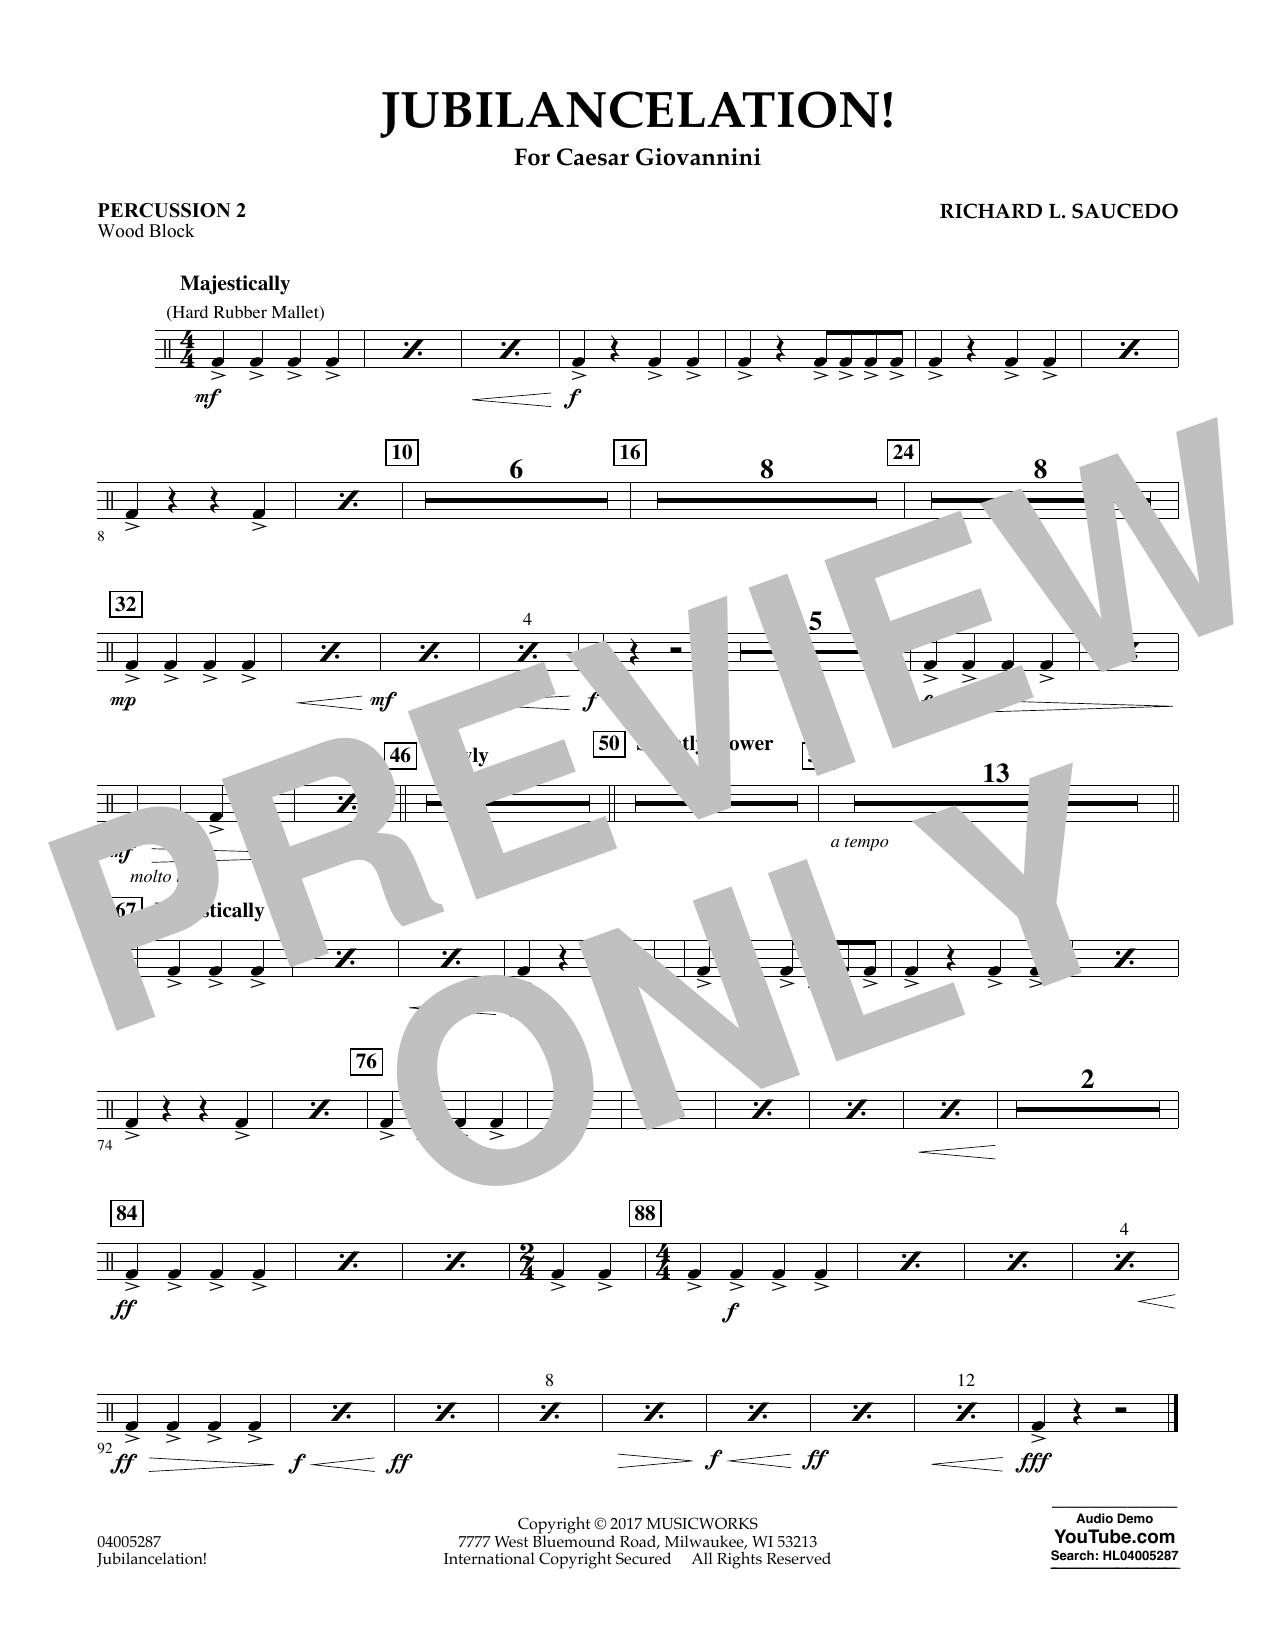 Jubilancelation! - Percussion 2